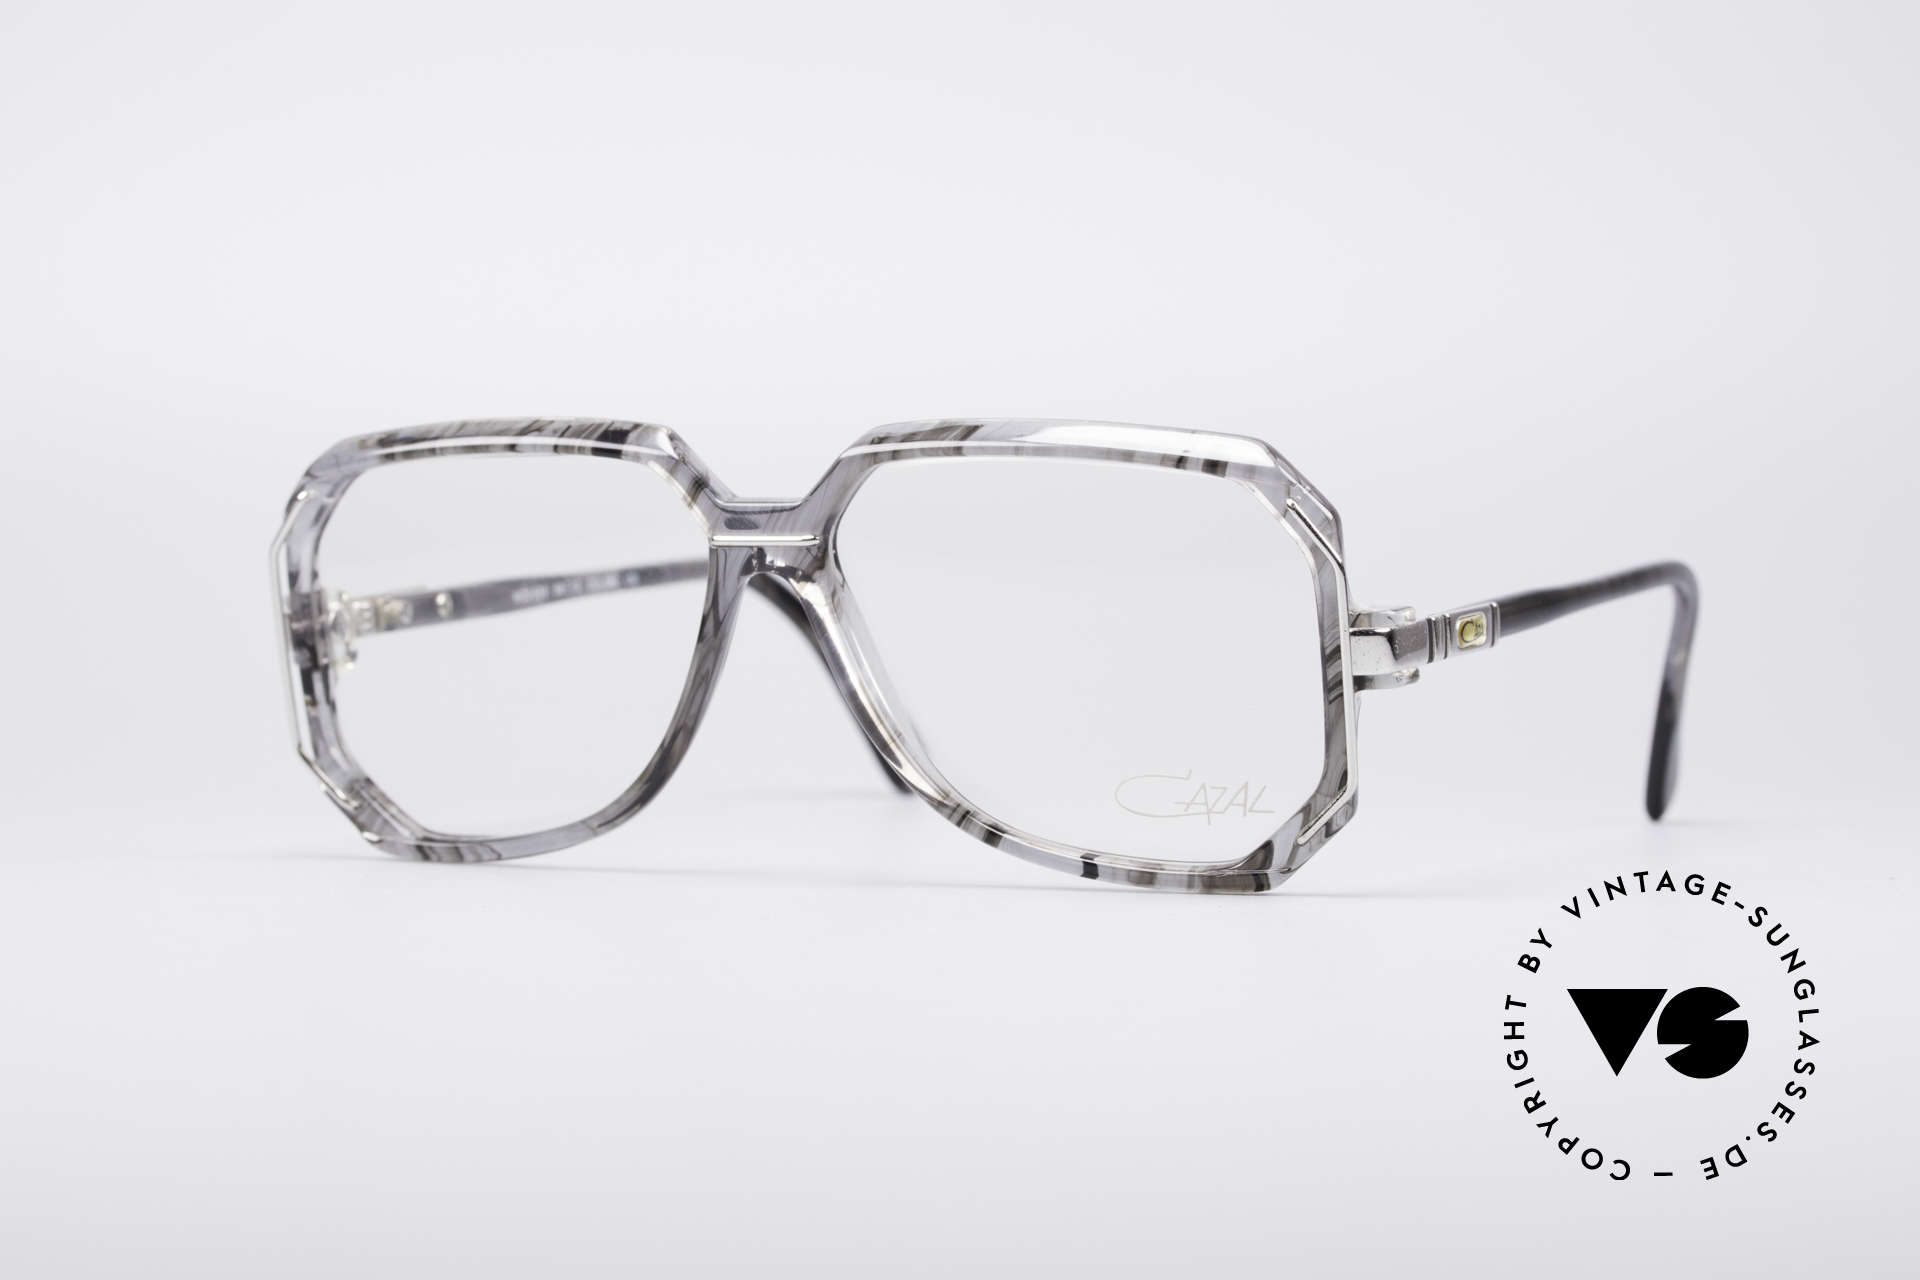 Cazal 639 Old School 80's Glasses, vintage 1980's Cazal 'W.Germany' designer glasses, Made for Men